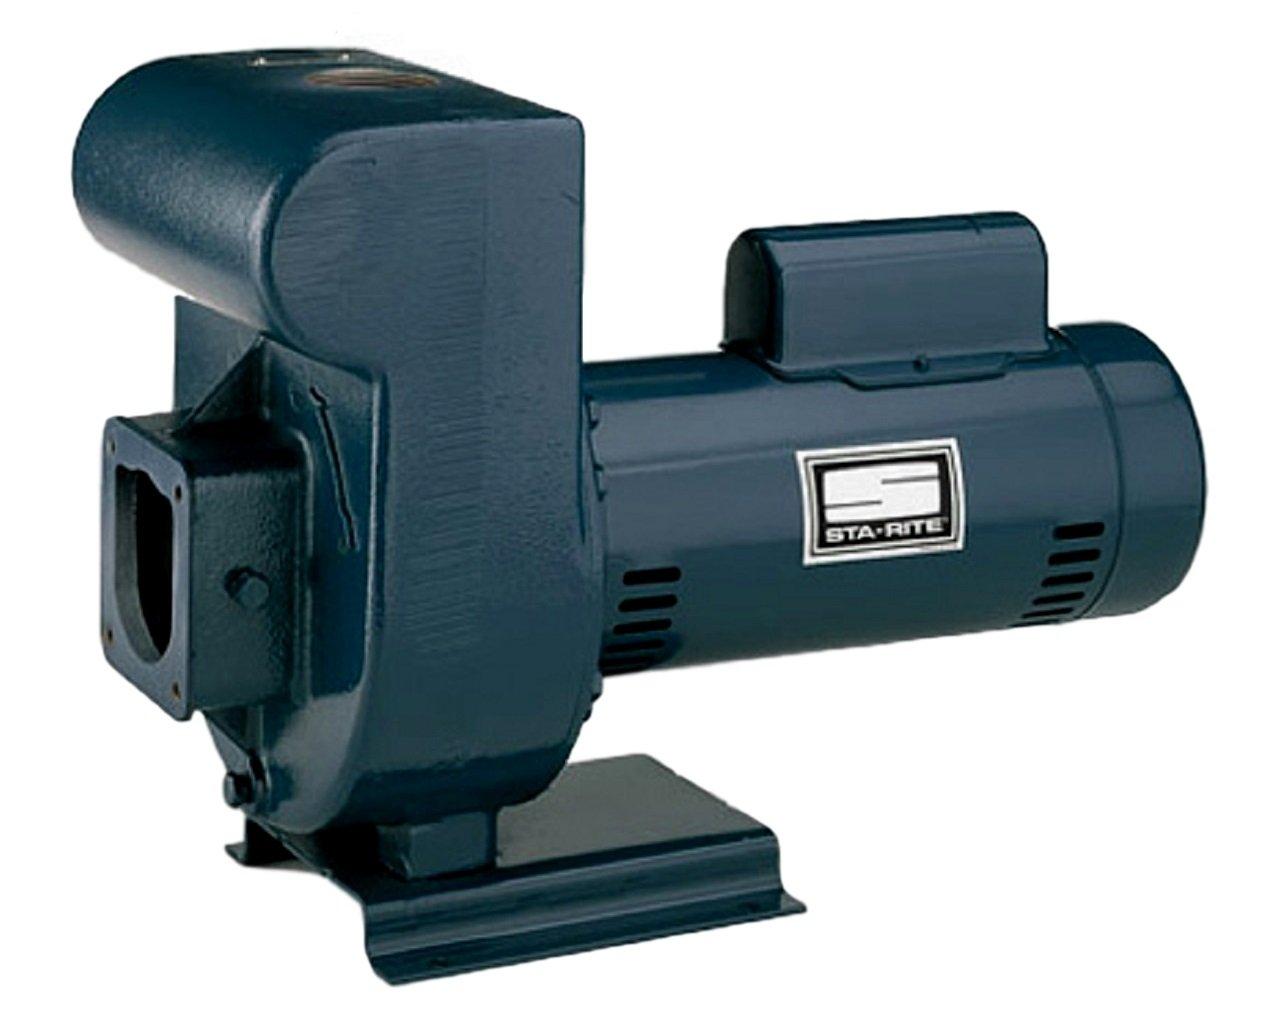 Pentair DMJ3-172 3-Phase Medium Head D-Series Self-Priming Centrifugal Commercial Pool Pump, 230/460-Volt, 5 HP by Pentair